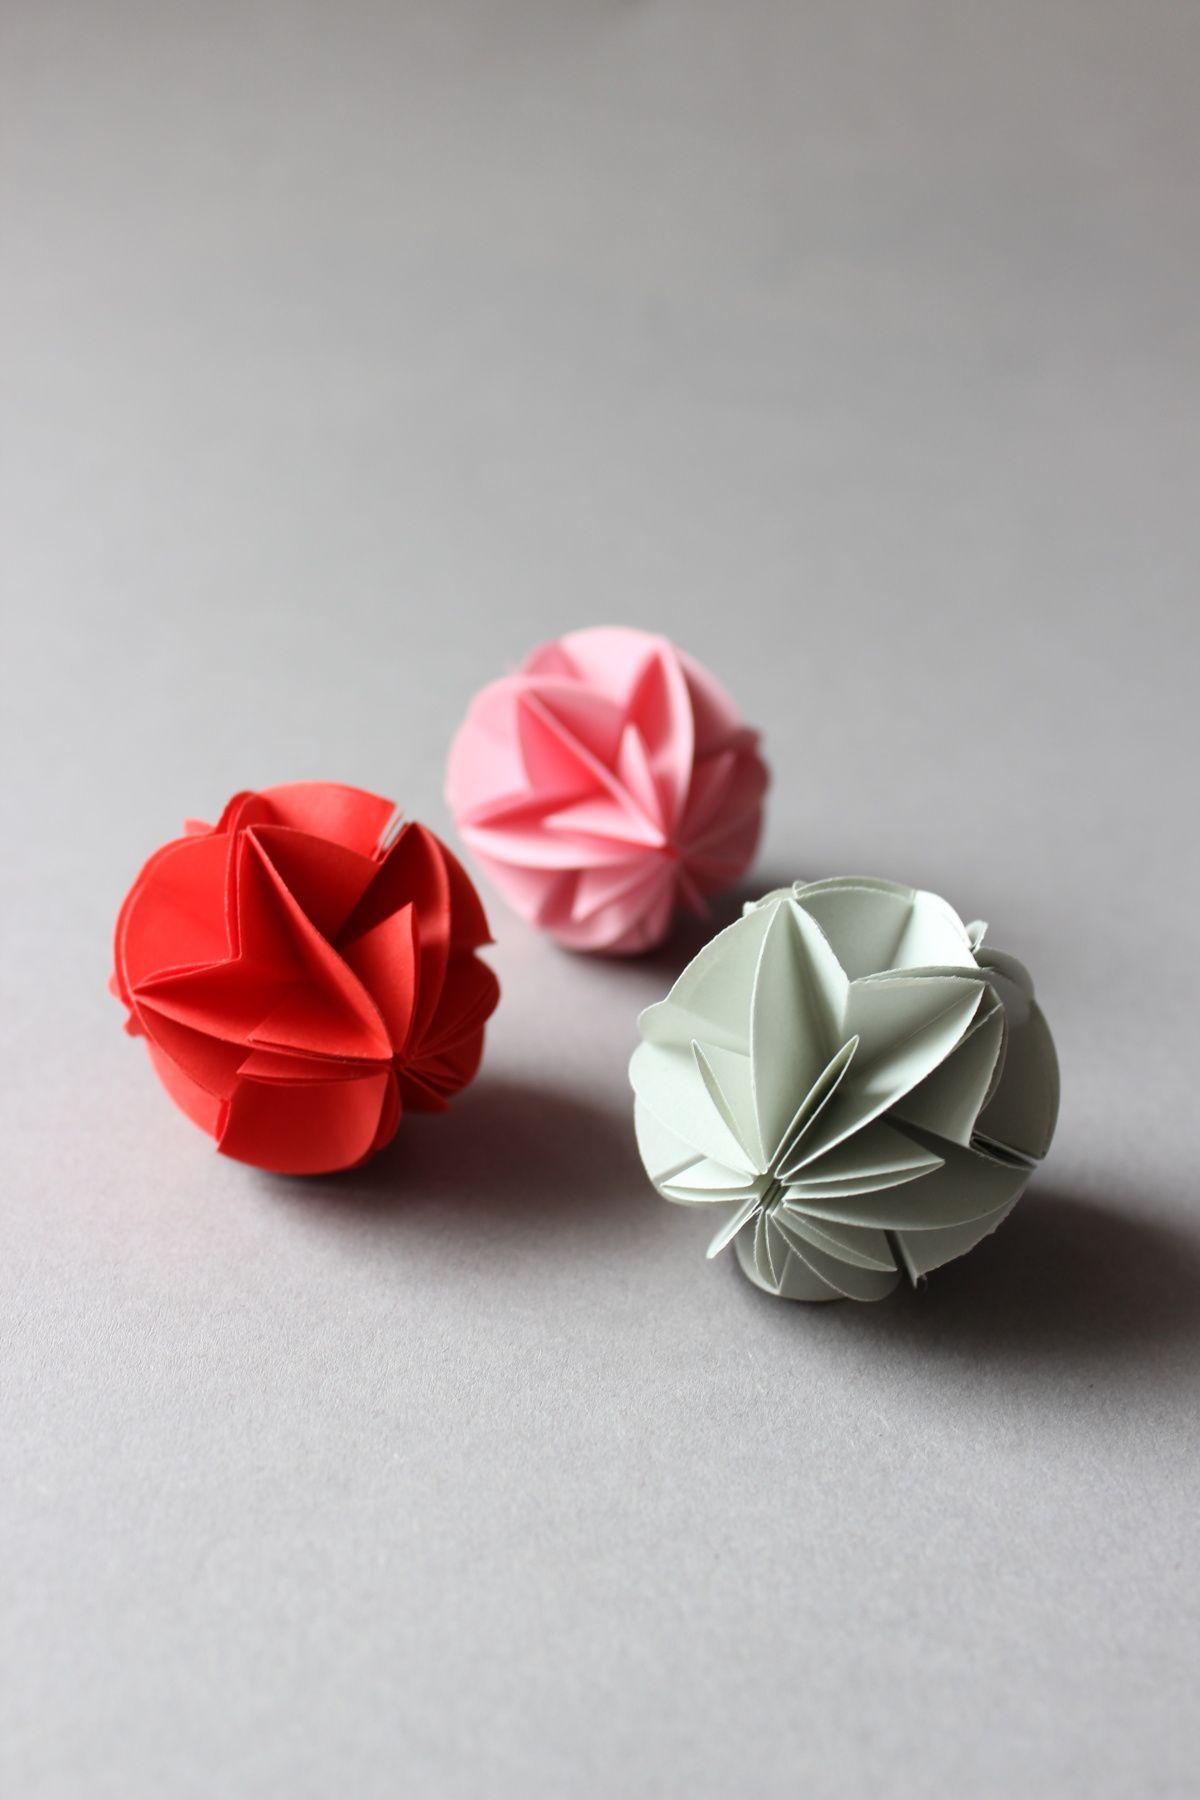 diy origami circuit ball origami papier und bascetta. Black Bedroom Furniture Sets. Home Design Ideas